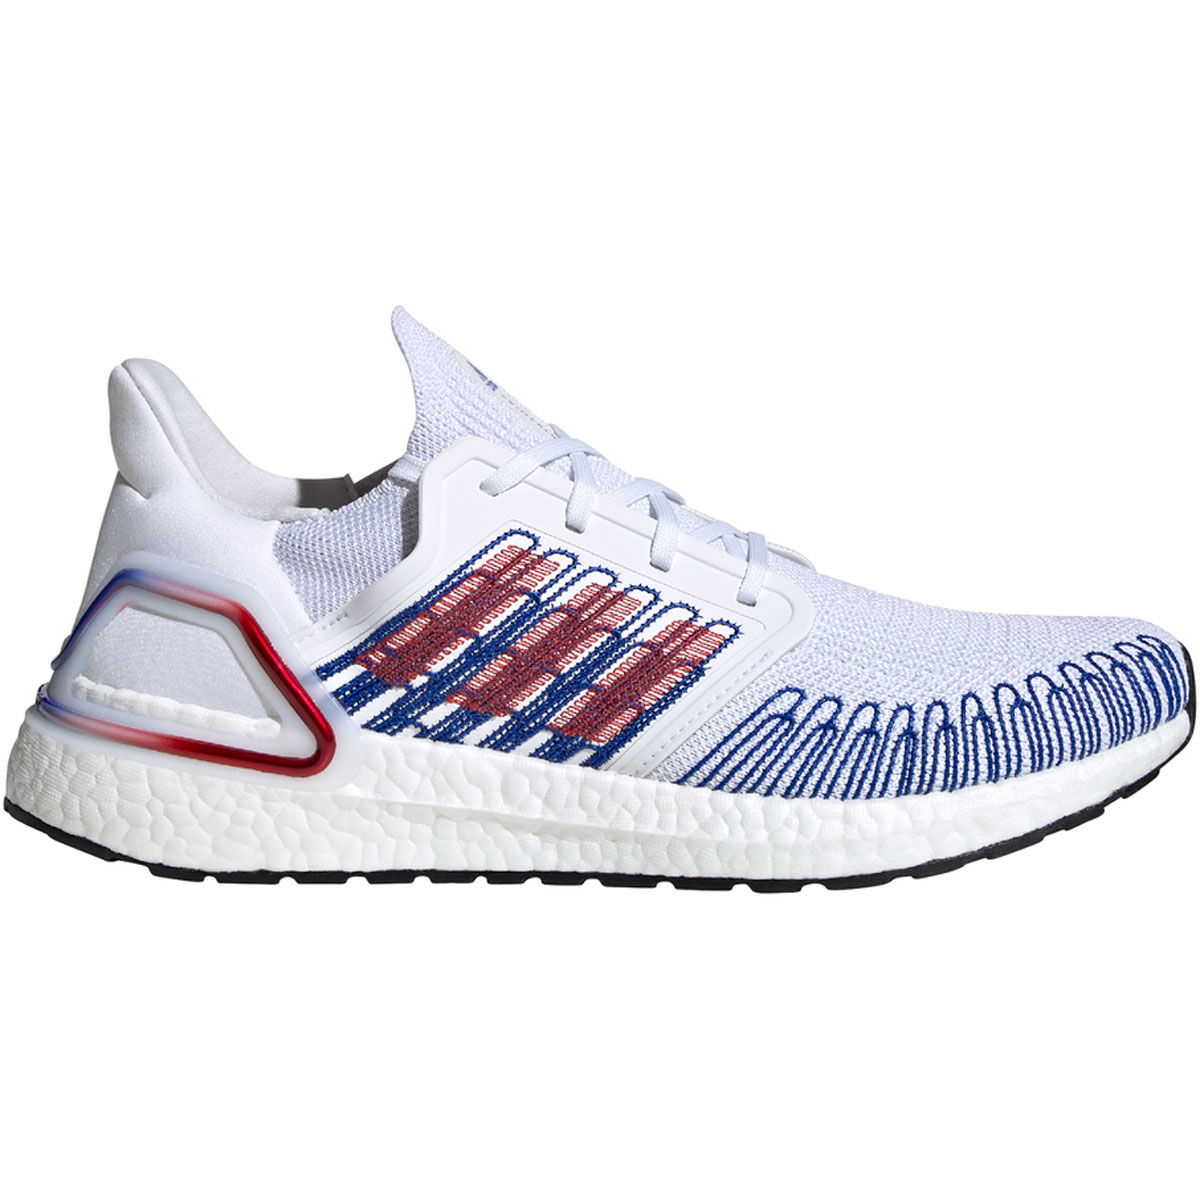 Men's Adidas Ultraboost 20 Running Shoe - Color: Cloud White/Scarlet/Royal Blue - Size: 6.5 - Width: Regular, Cloud White/Scarlet/Royal Blue, large, image 1